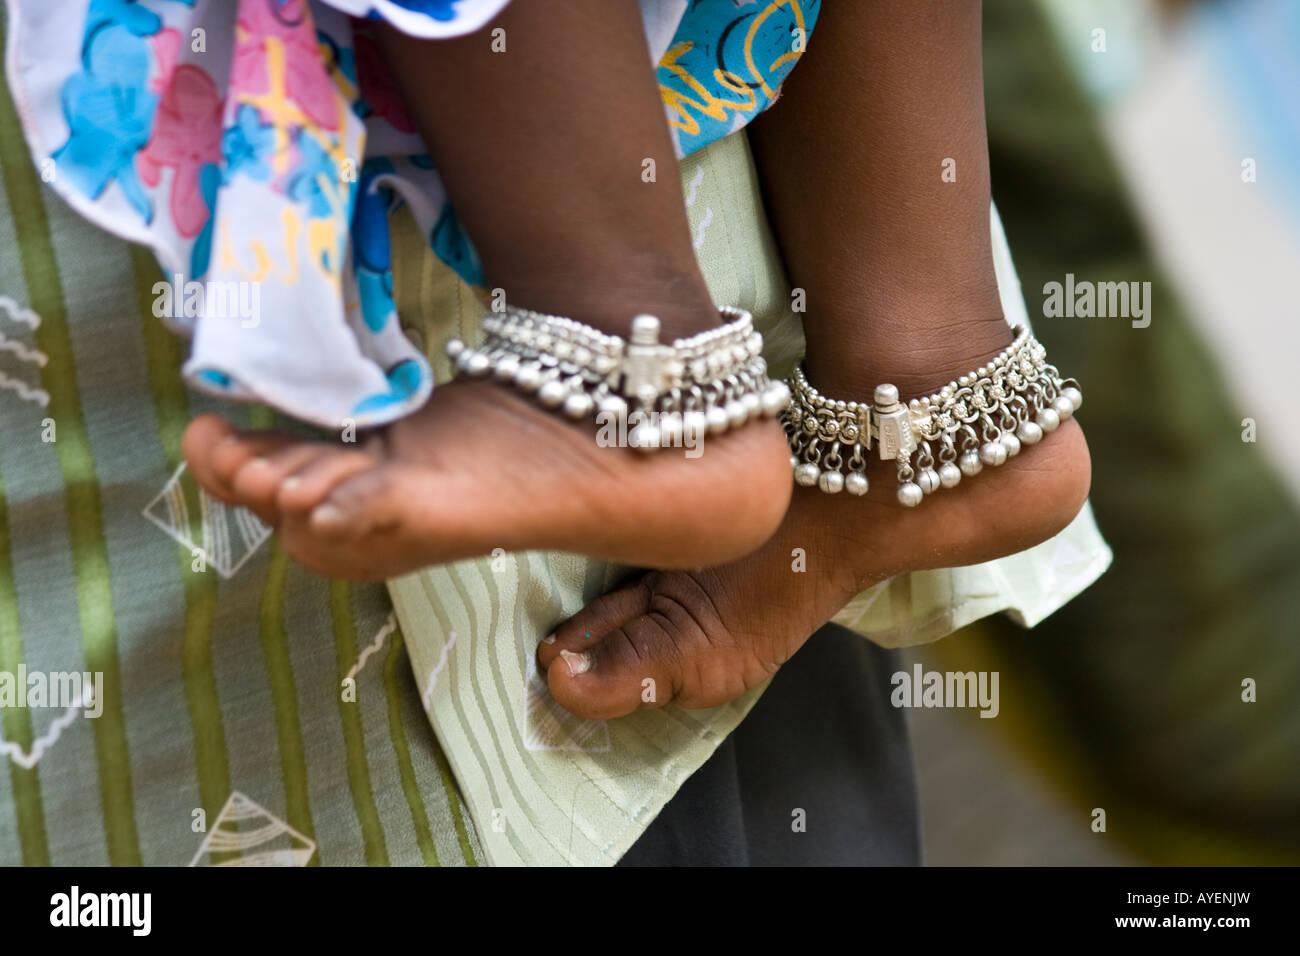 Little Girl Wearing Silver Ankle Bracelets In Sree Meenakshi Hindu Temple  In Madurai South India